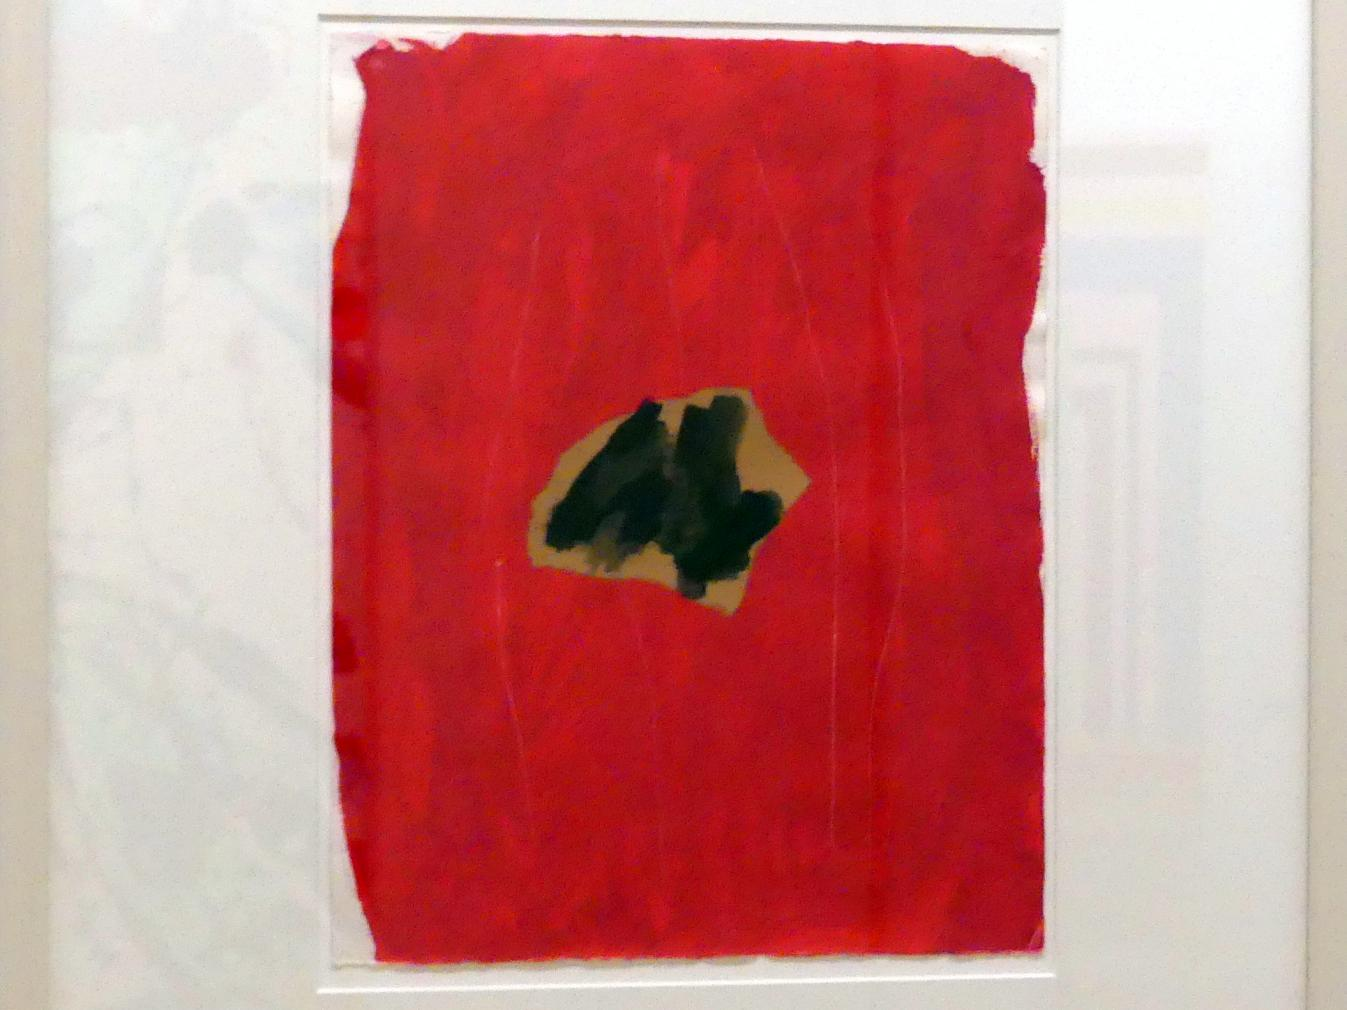 Robert Motherwell: Ohne Titel, 1977